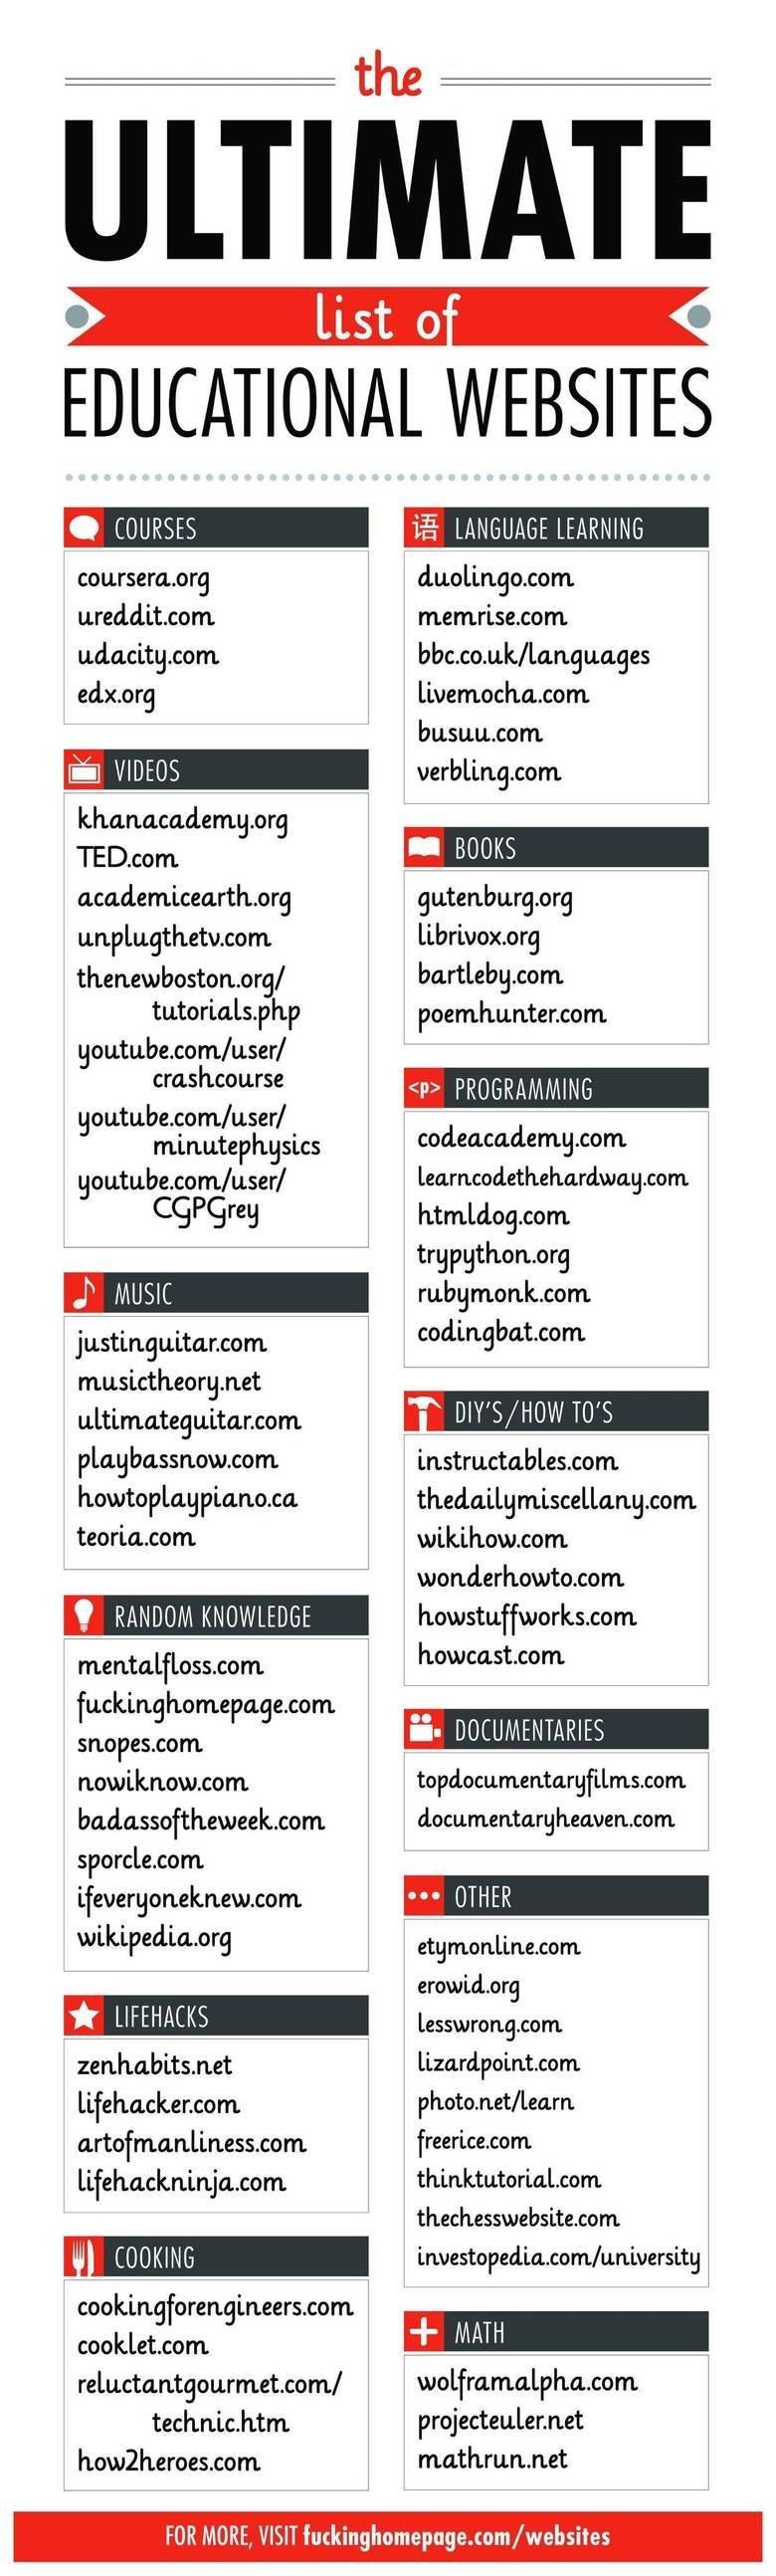 Best Websites. . q list CE q EDUCATIONAL WEBSITES u, COURSES cou. rseja.. org creddit. corra edx. org E VIDEOS TED. com. corra tutor' Lals. php rowser/ crashcou